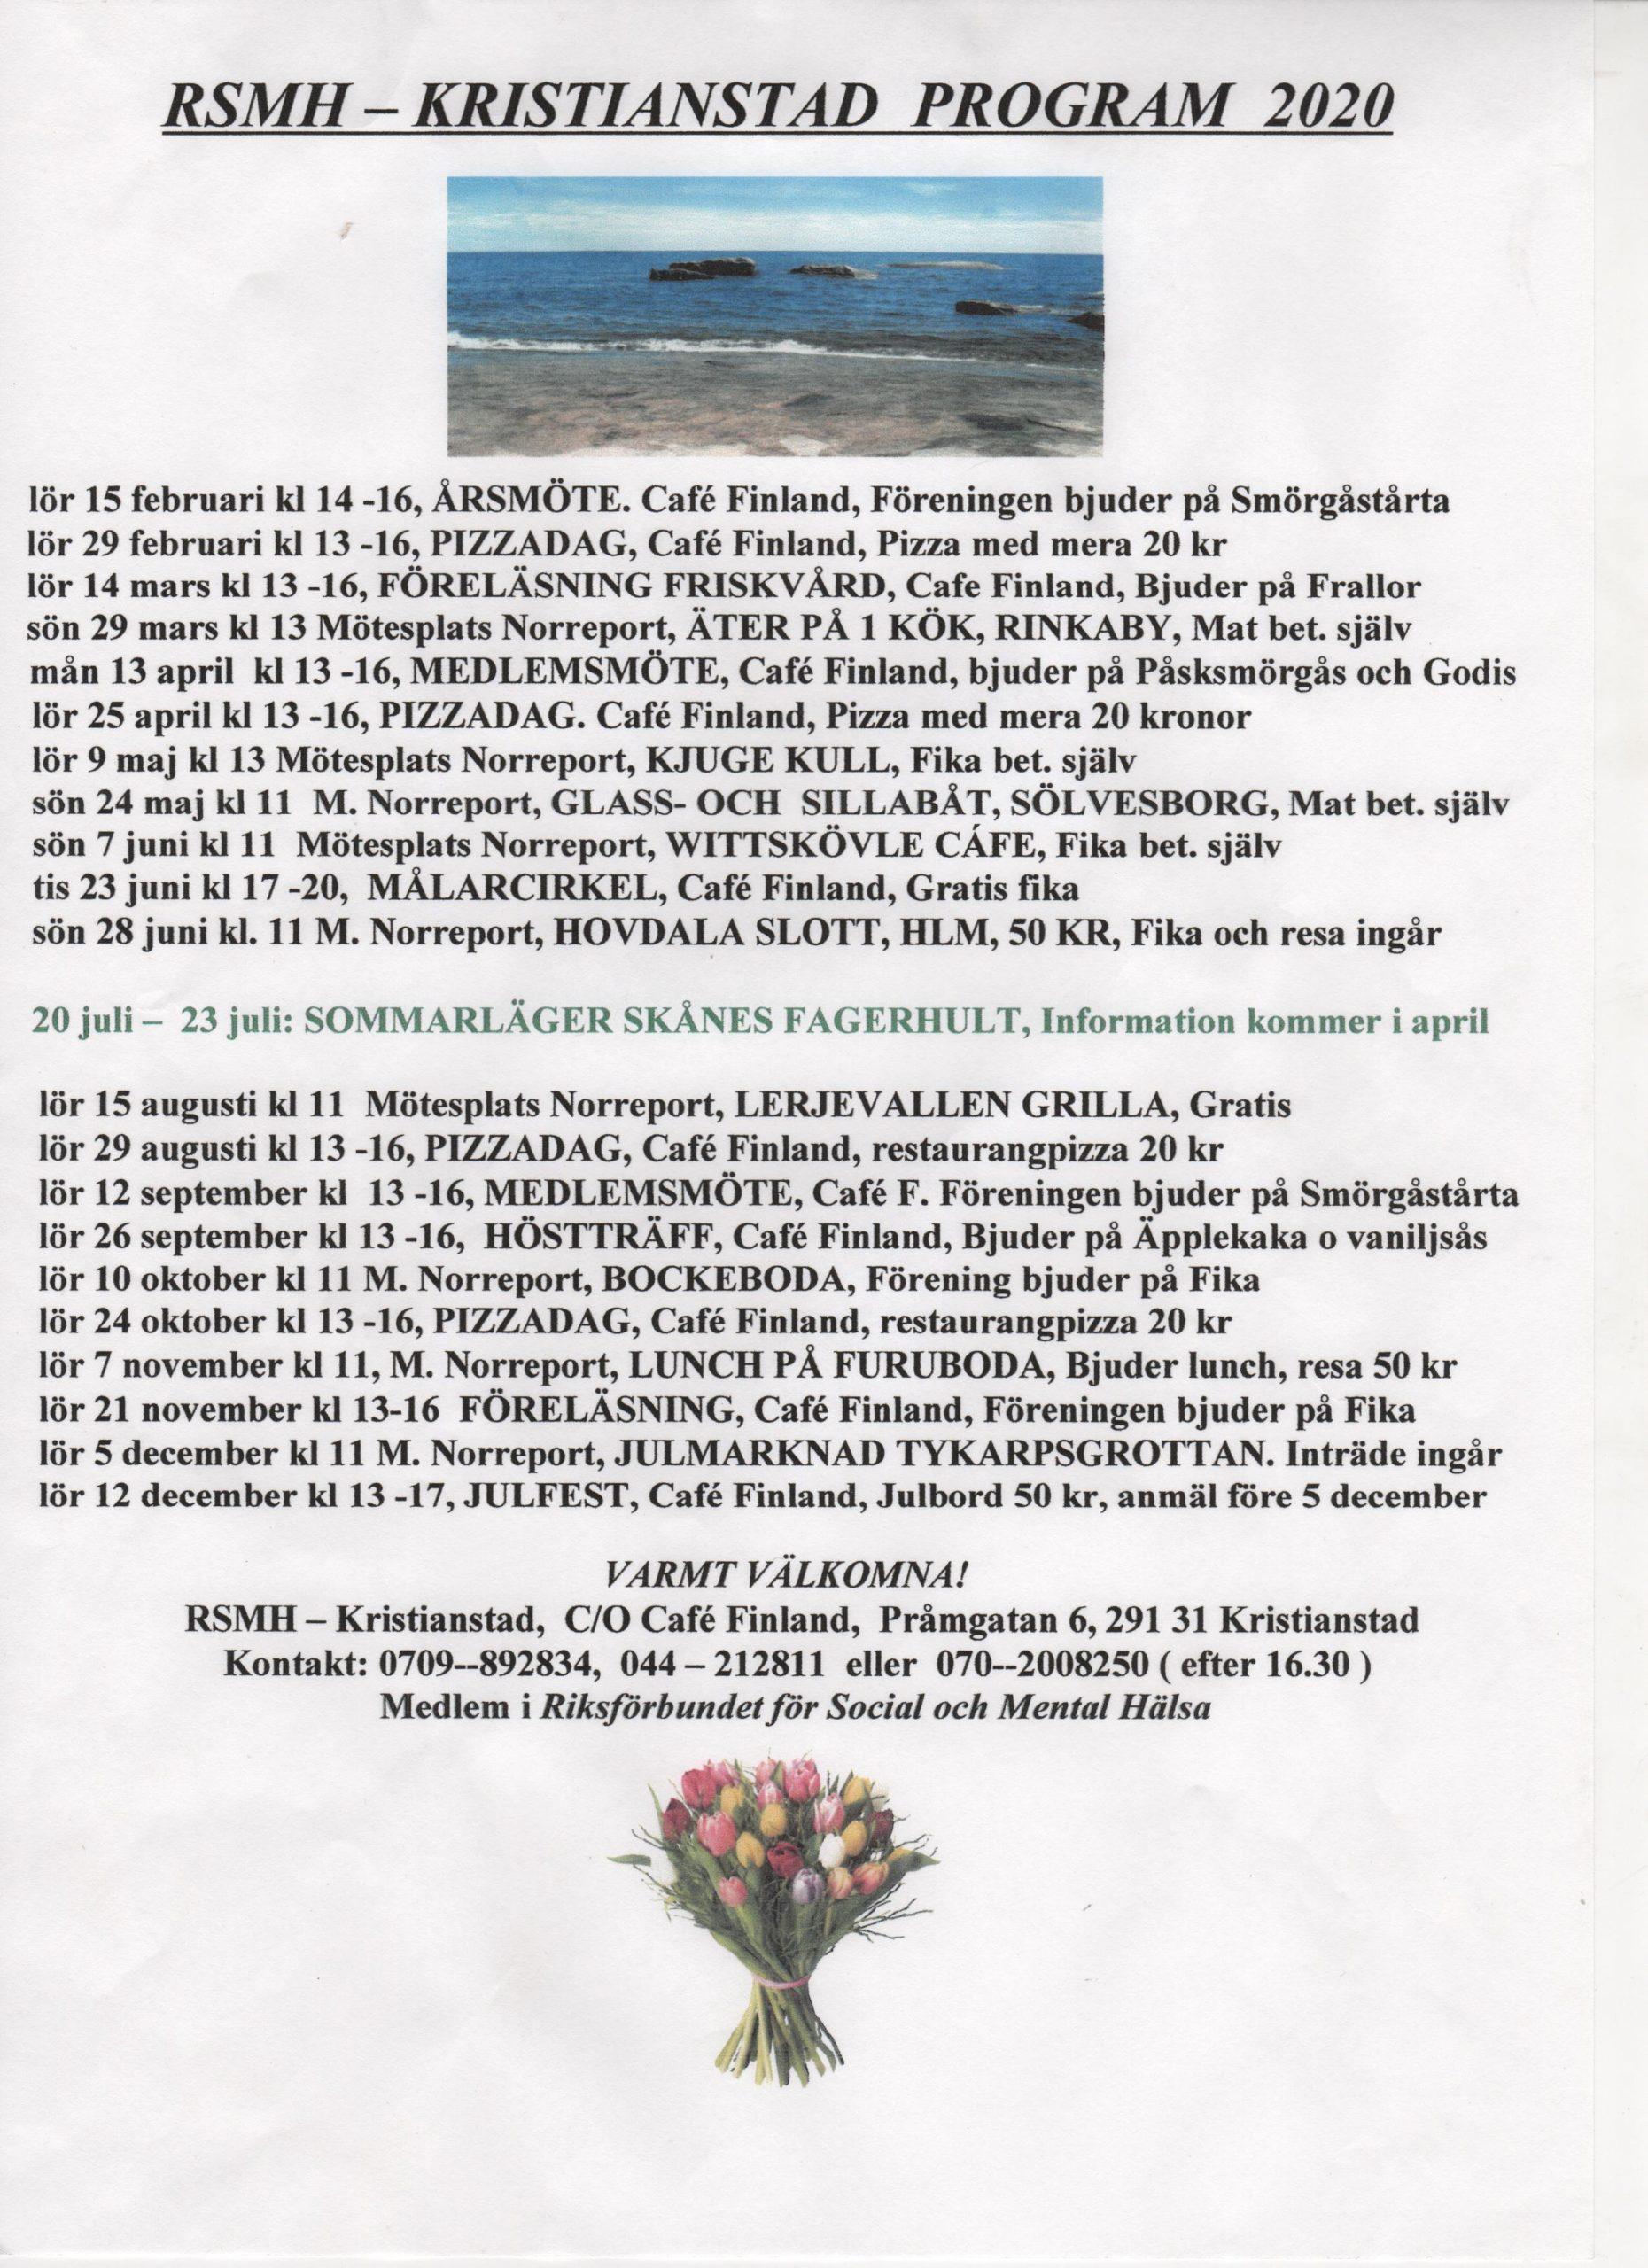 Kristianstads program 2020